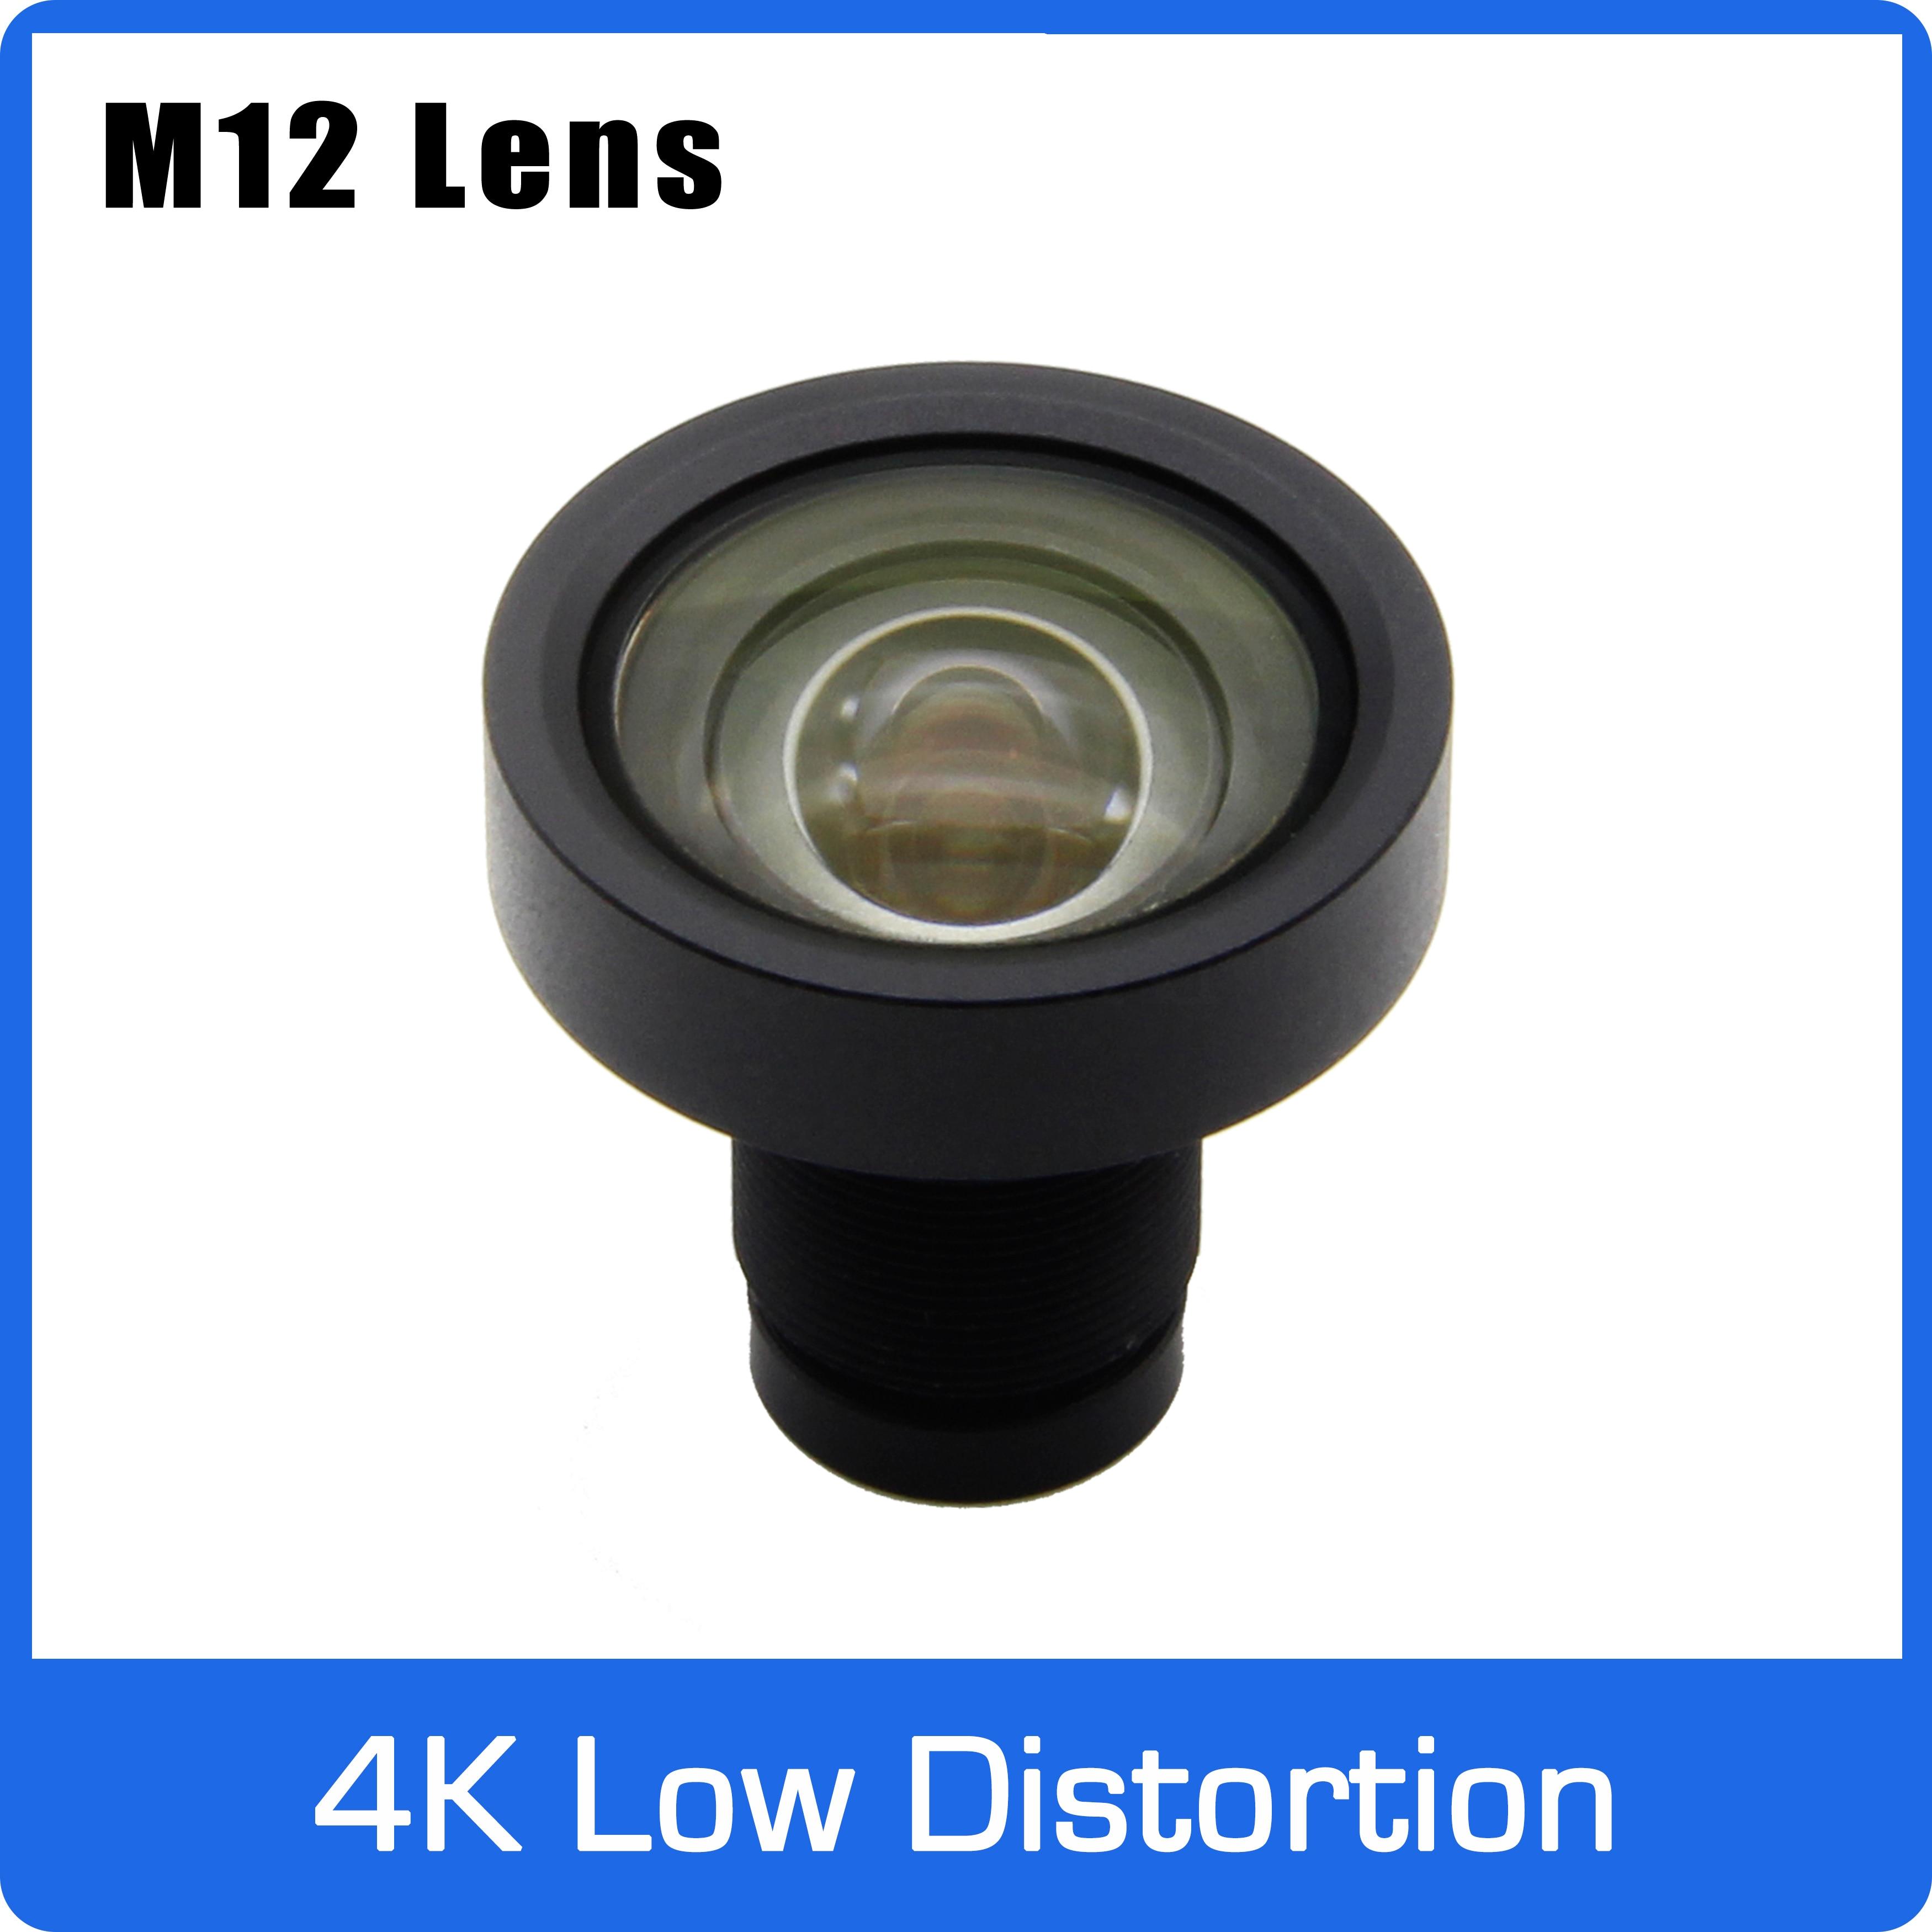 8 megapíxeles fijos 1/1.8 pulgadas 4,5mm baja distorsión F2.0 lente para SONY IMX178/226/334 OV OS08A10 8MP cámara CCTV IP envío gratis